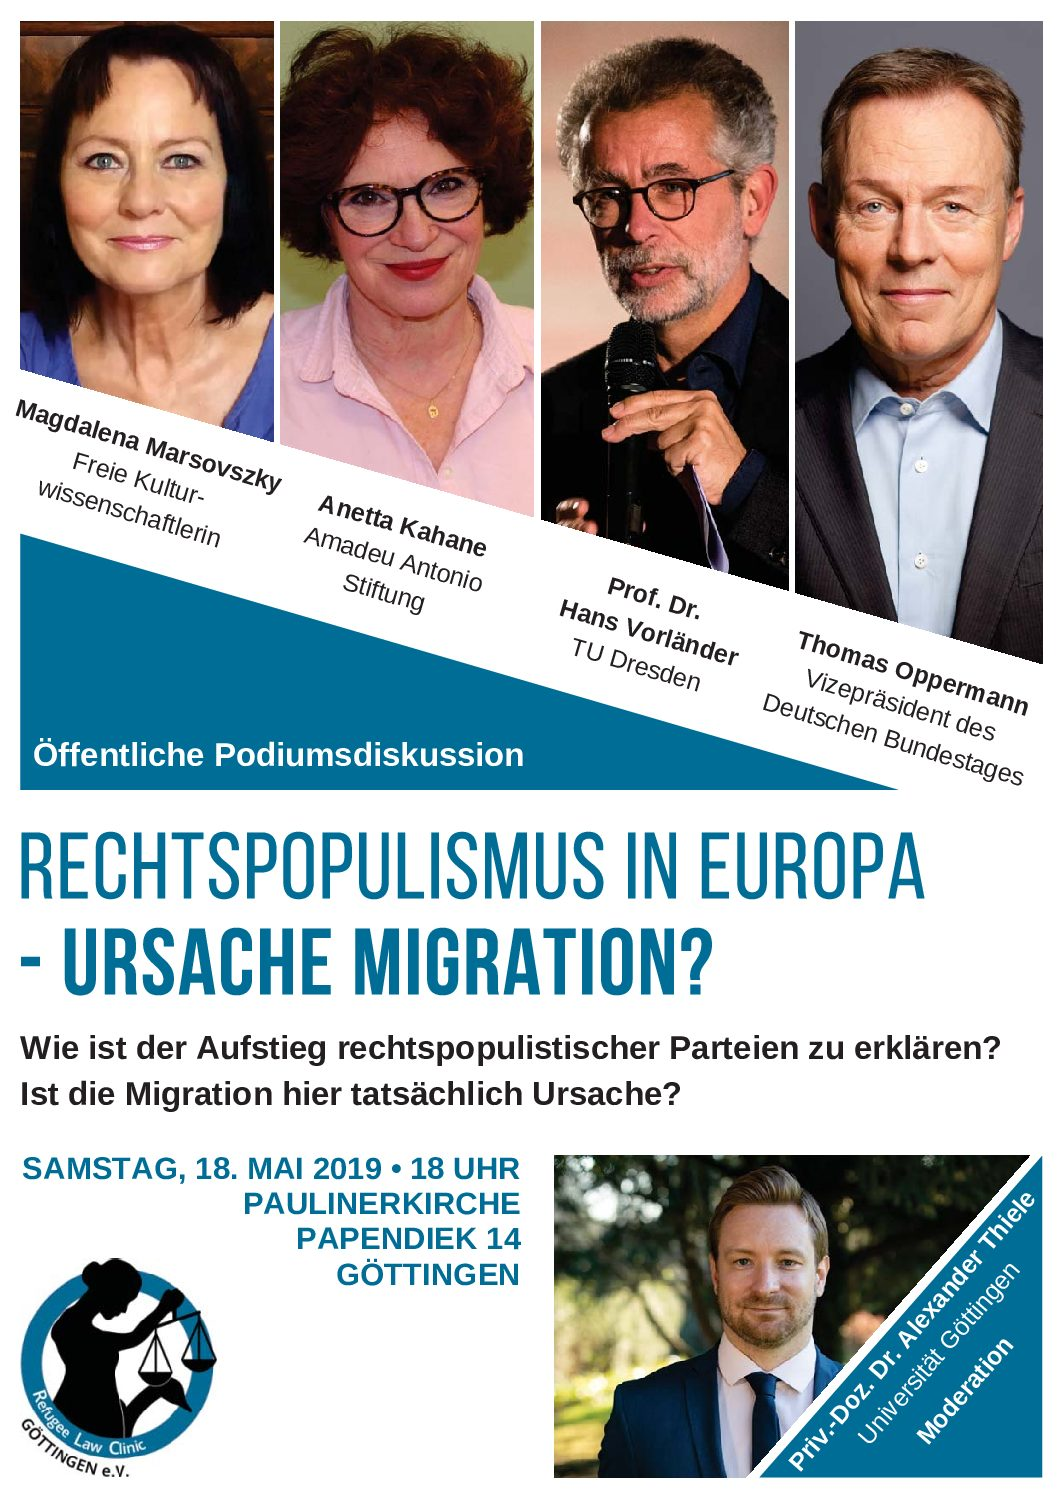 Podiumsdiskussion – Rechtspopulismus in Europa – Ursache Migration?